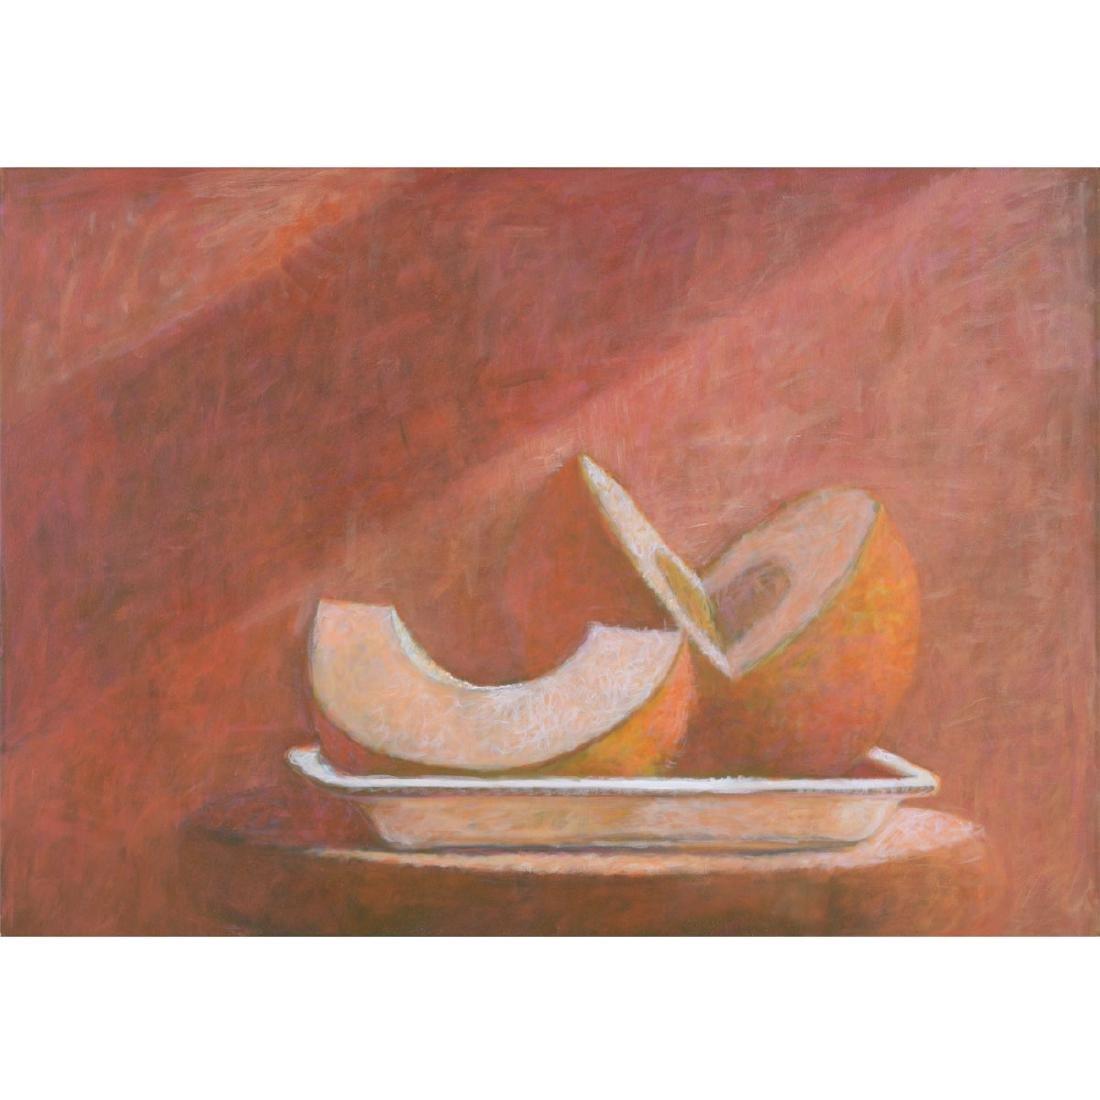 "Kipp Stewart ""Still Life with Melon"" oil on canvas"